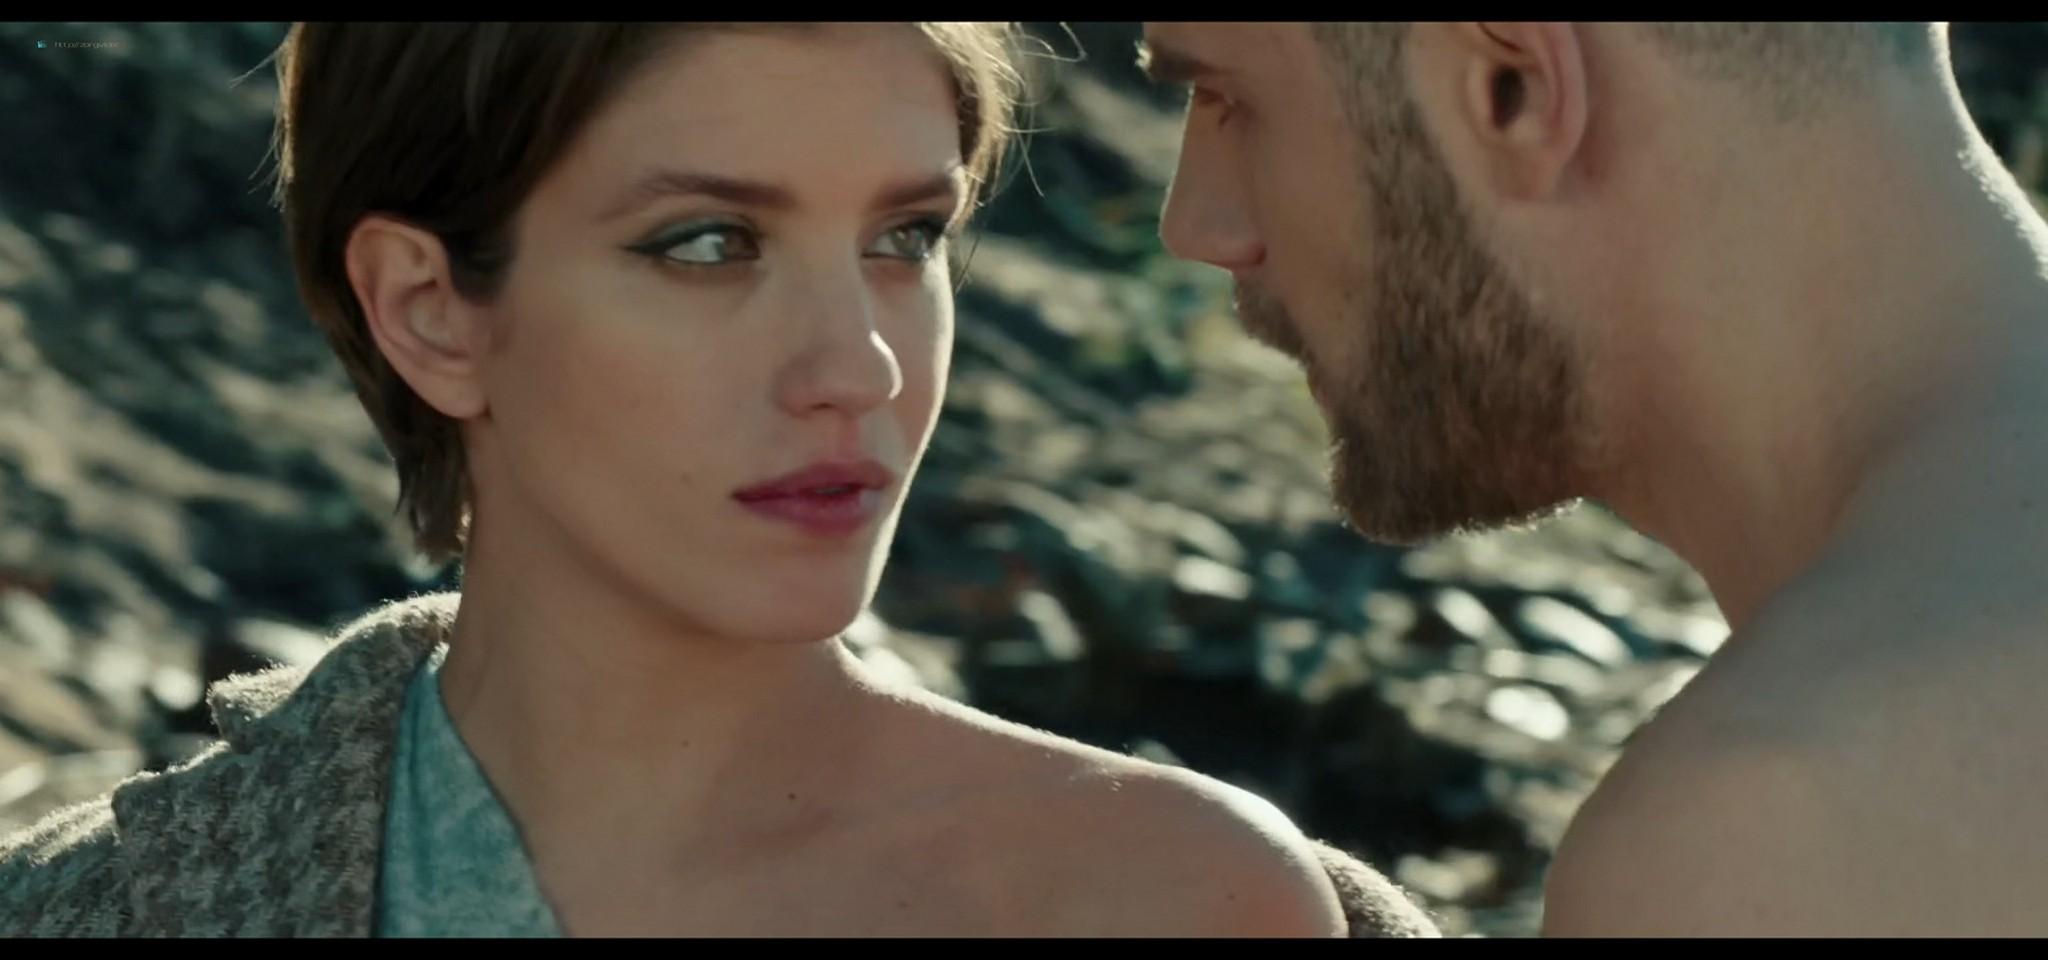 Yulia Snigir hot and some sex Anna Chipovskaya, Yuliya Peresild sexy - The End of the Season (2019) HD 1080p Web (6)